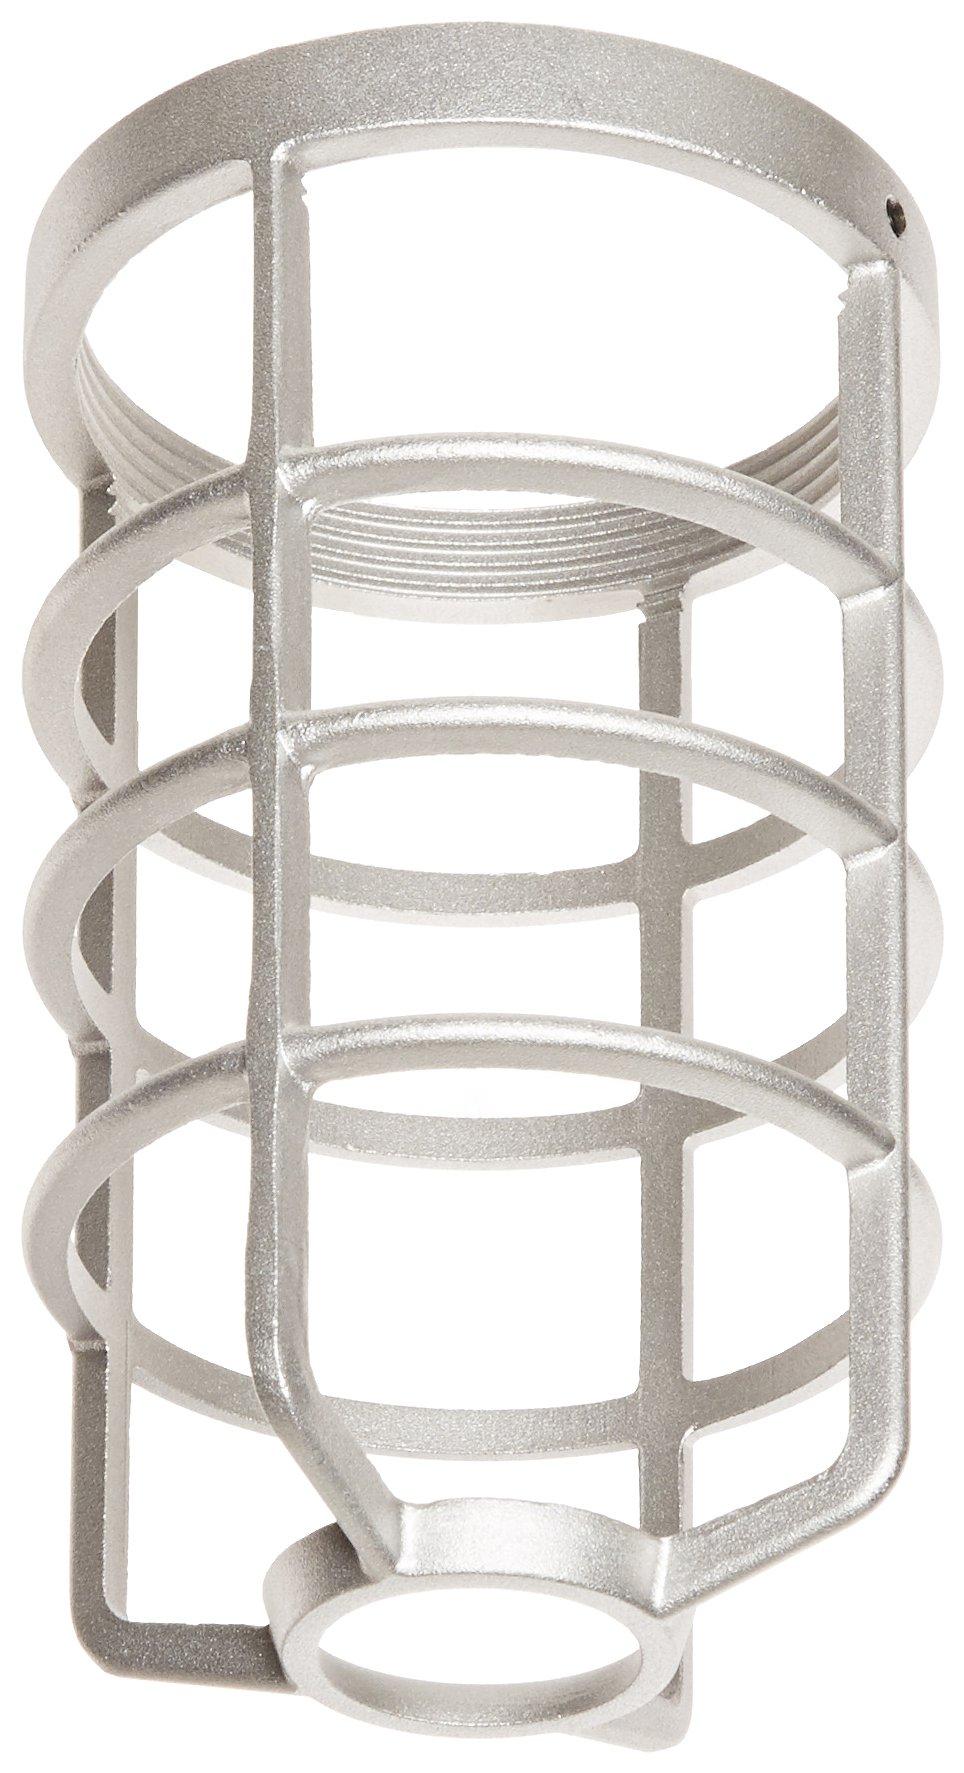 RAB Lighting GD100DG 100 Series Vapor Proof Round Bottom Clamp Guard, Die Cast Aluminum, Natural